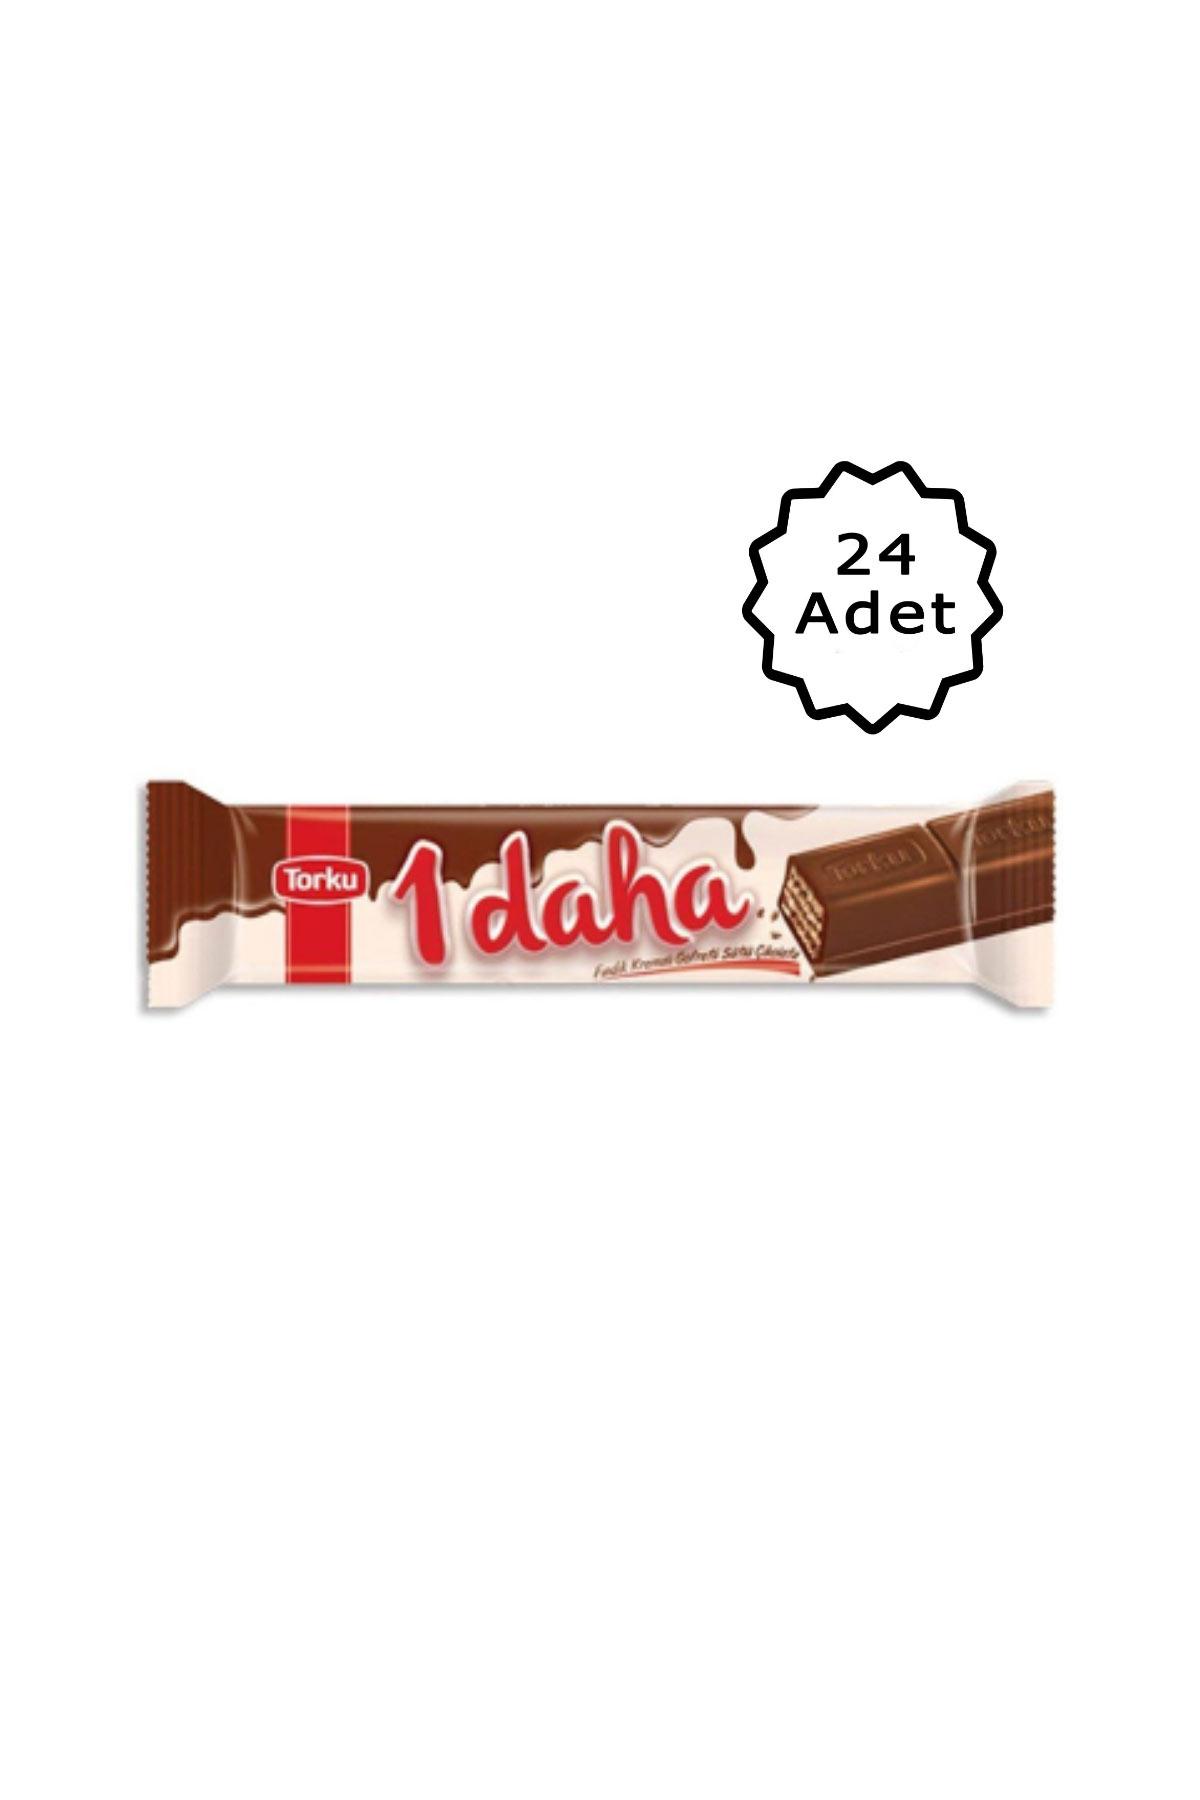 Torku 1 Daha Sütlü Çikolatalı Gofret 38 Gr 24 Adet